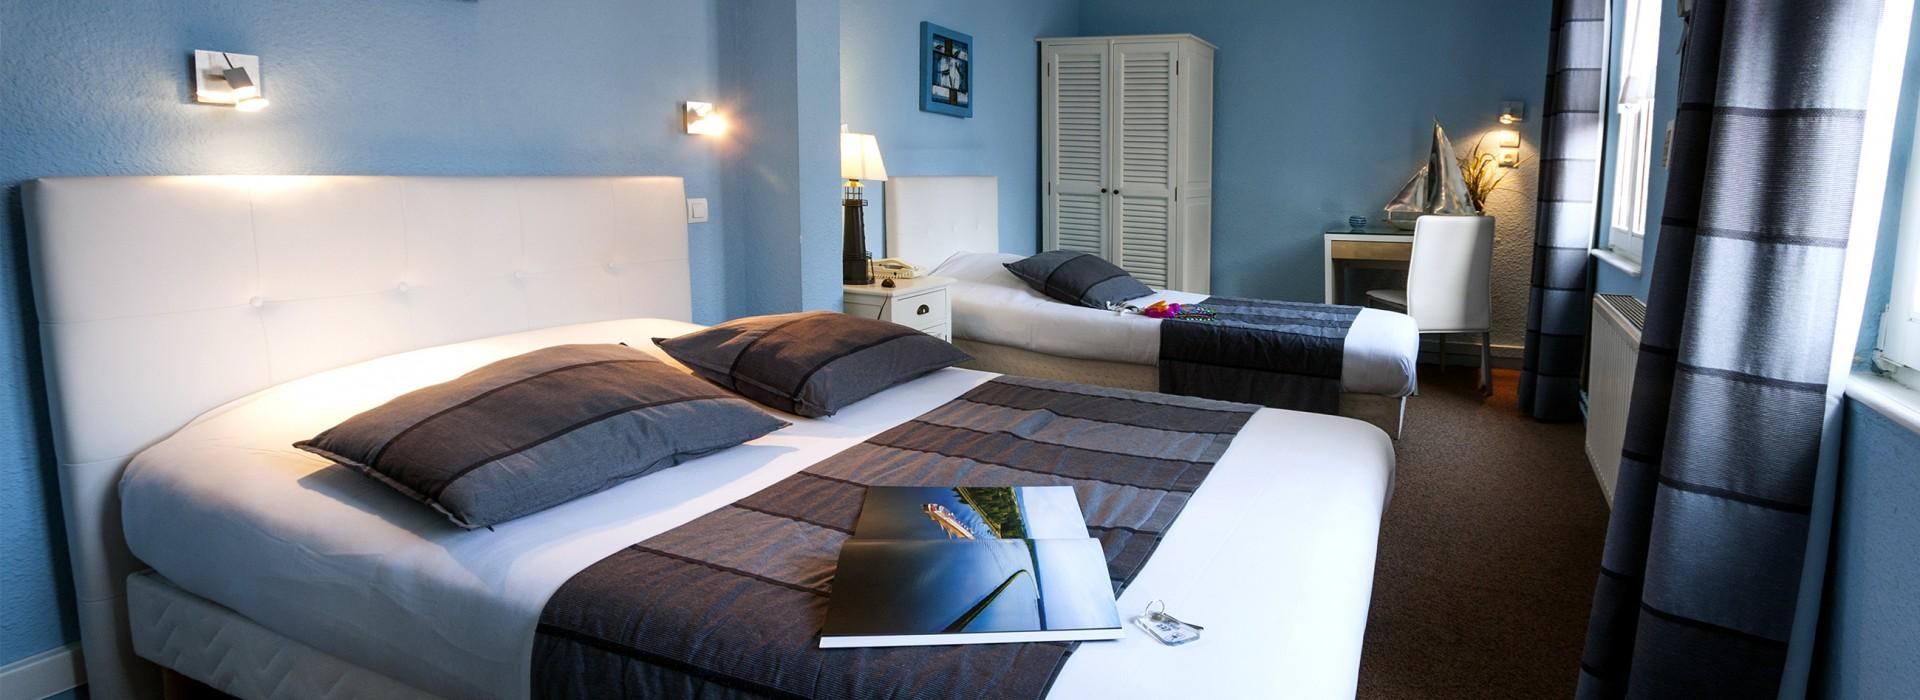 http://etc-hotel.com/public/uploads/2016/02/227_OCEAN_IMG_5227_RVB_HD-1920x700.jpg